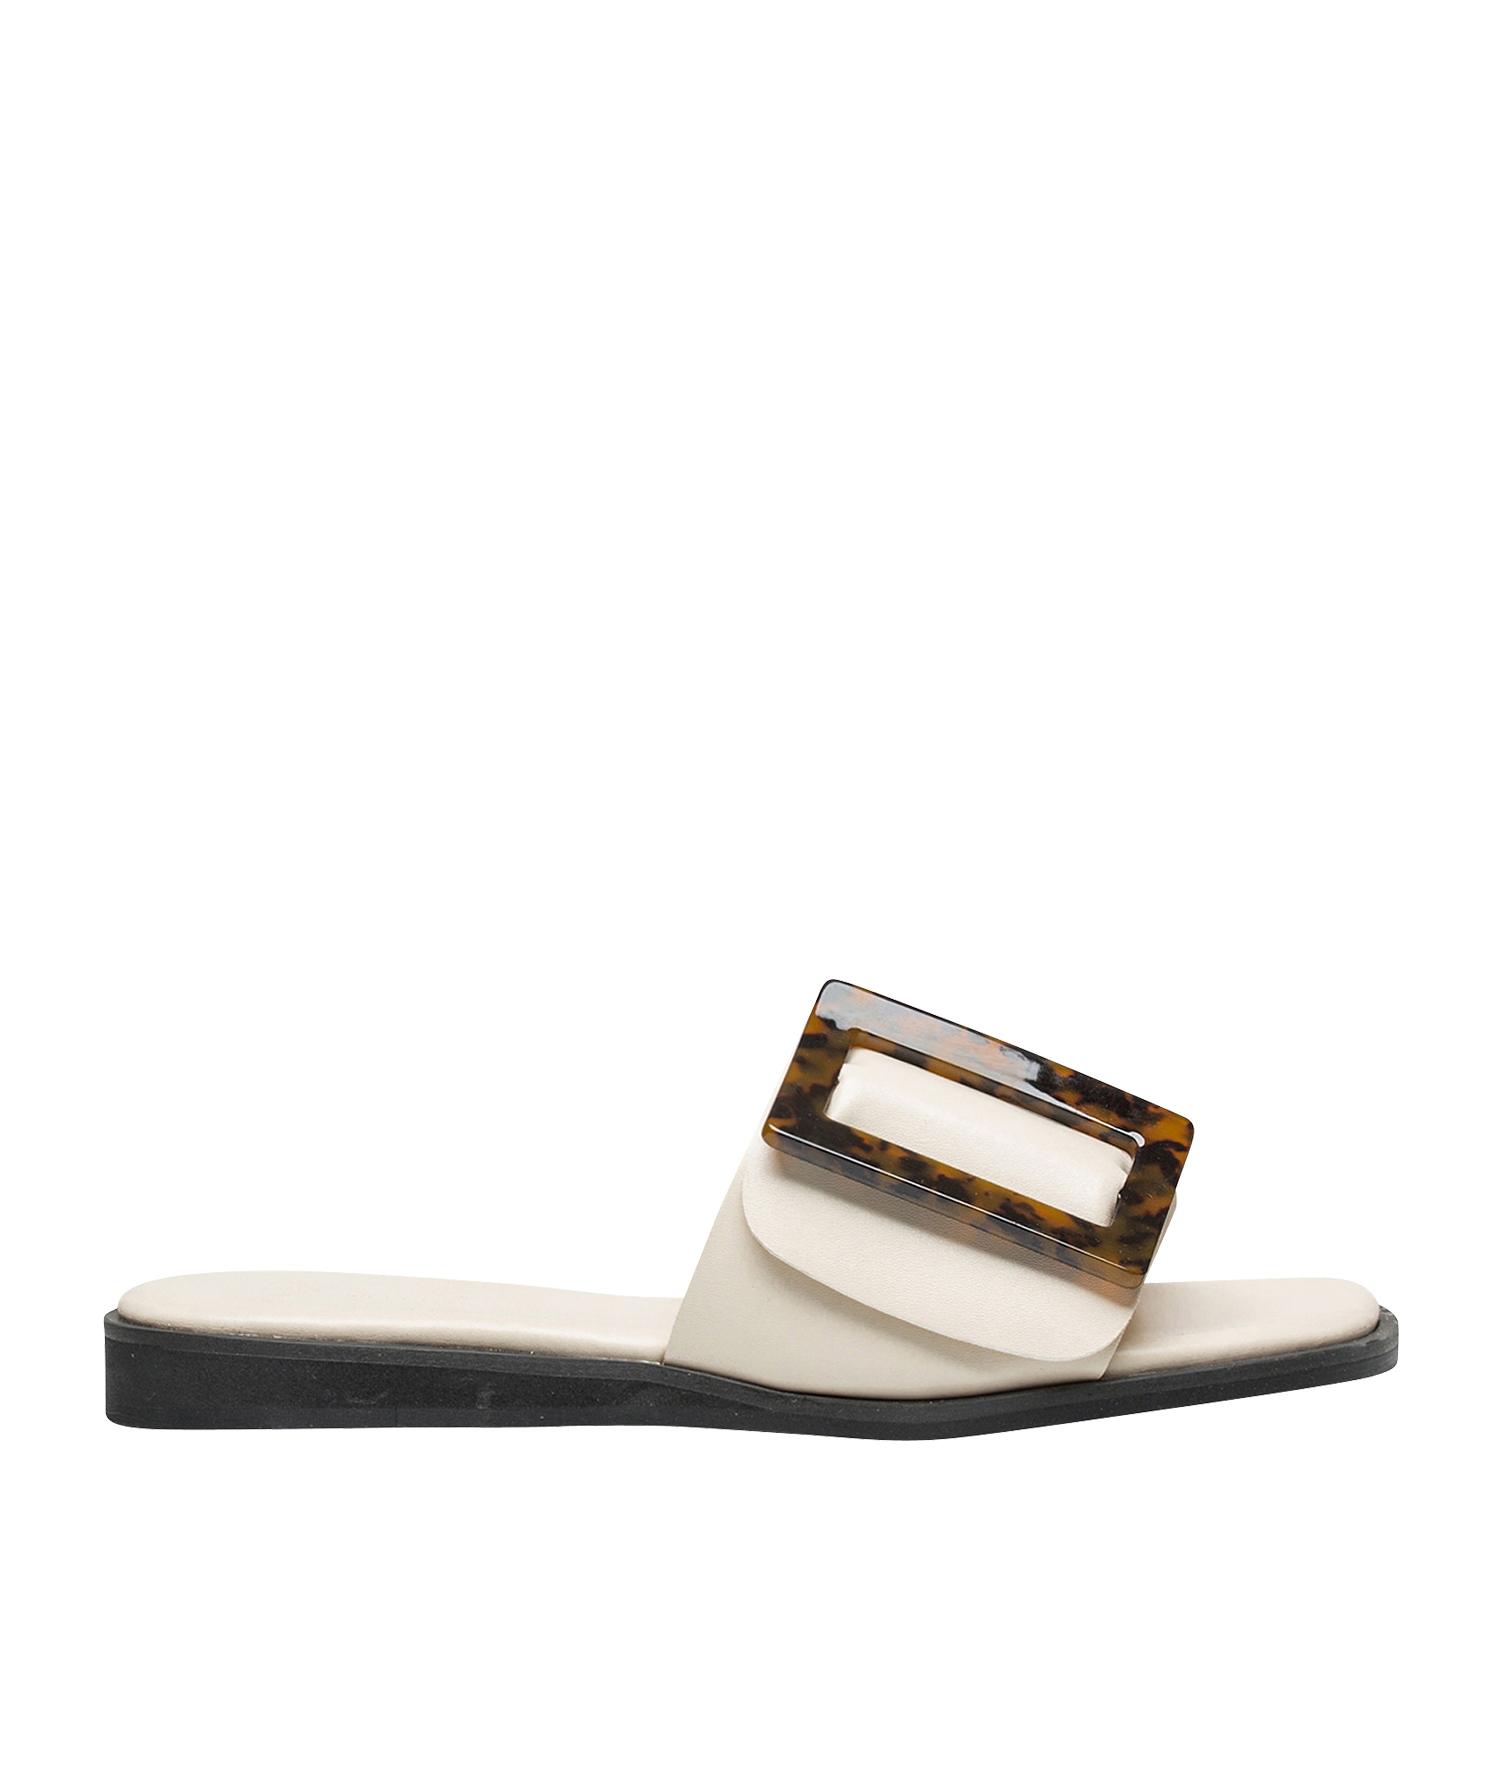 6d1055e32717 AnnaKastle Womens Square Buckle Flat Slide Sandals Ivory